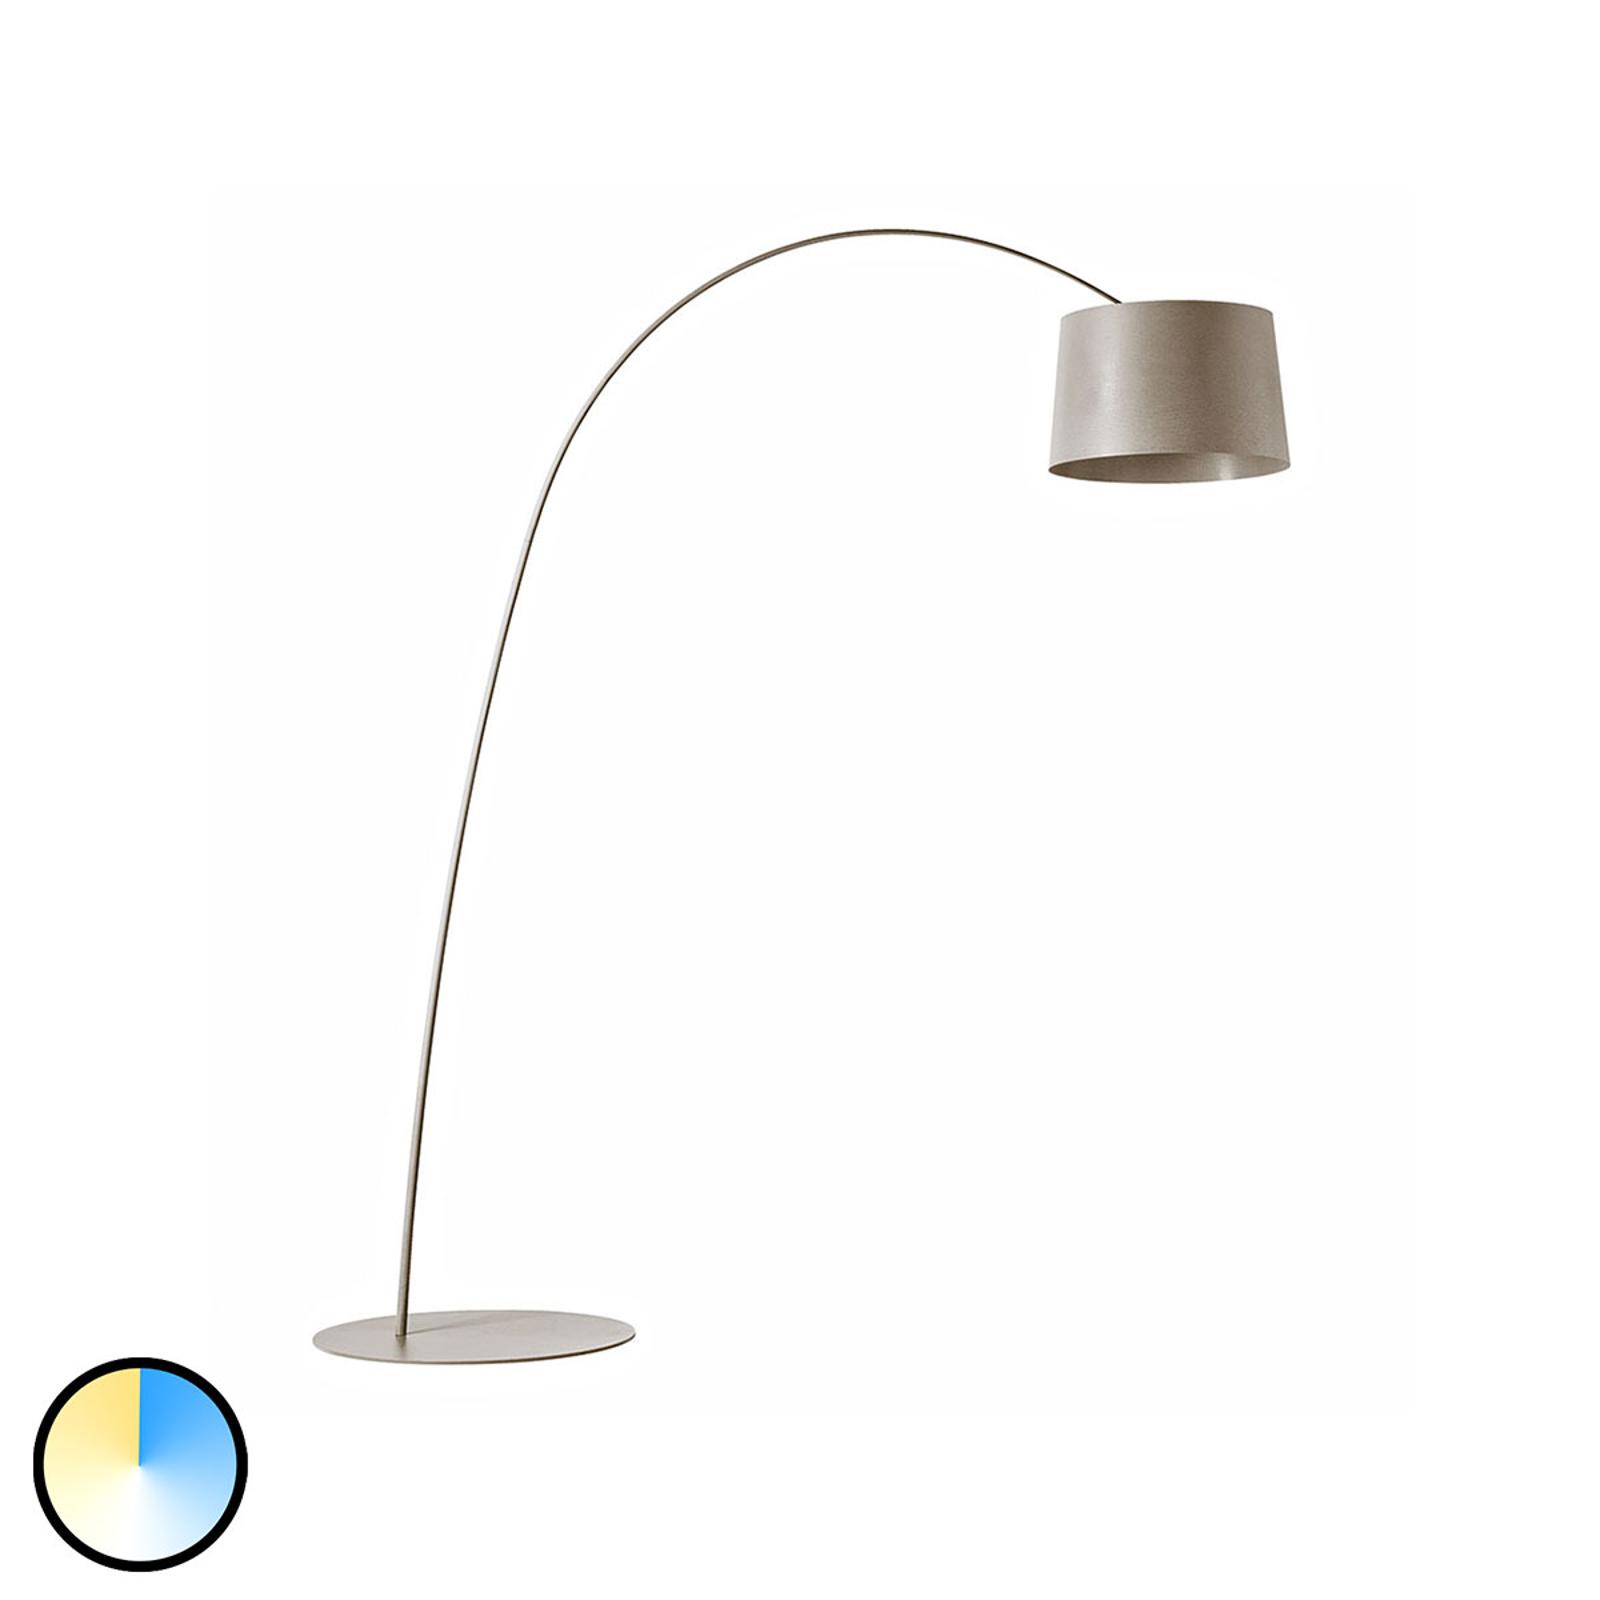 Foscarini MyLight Twiggy lampe arquée LED, grège